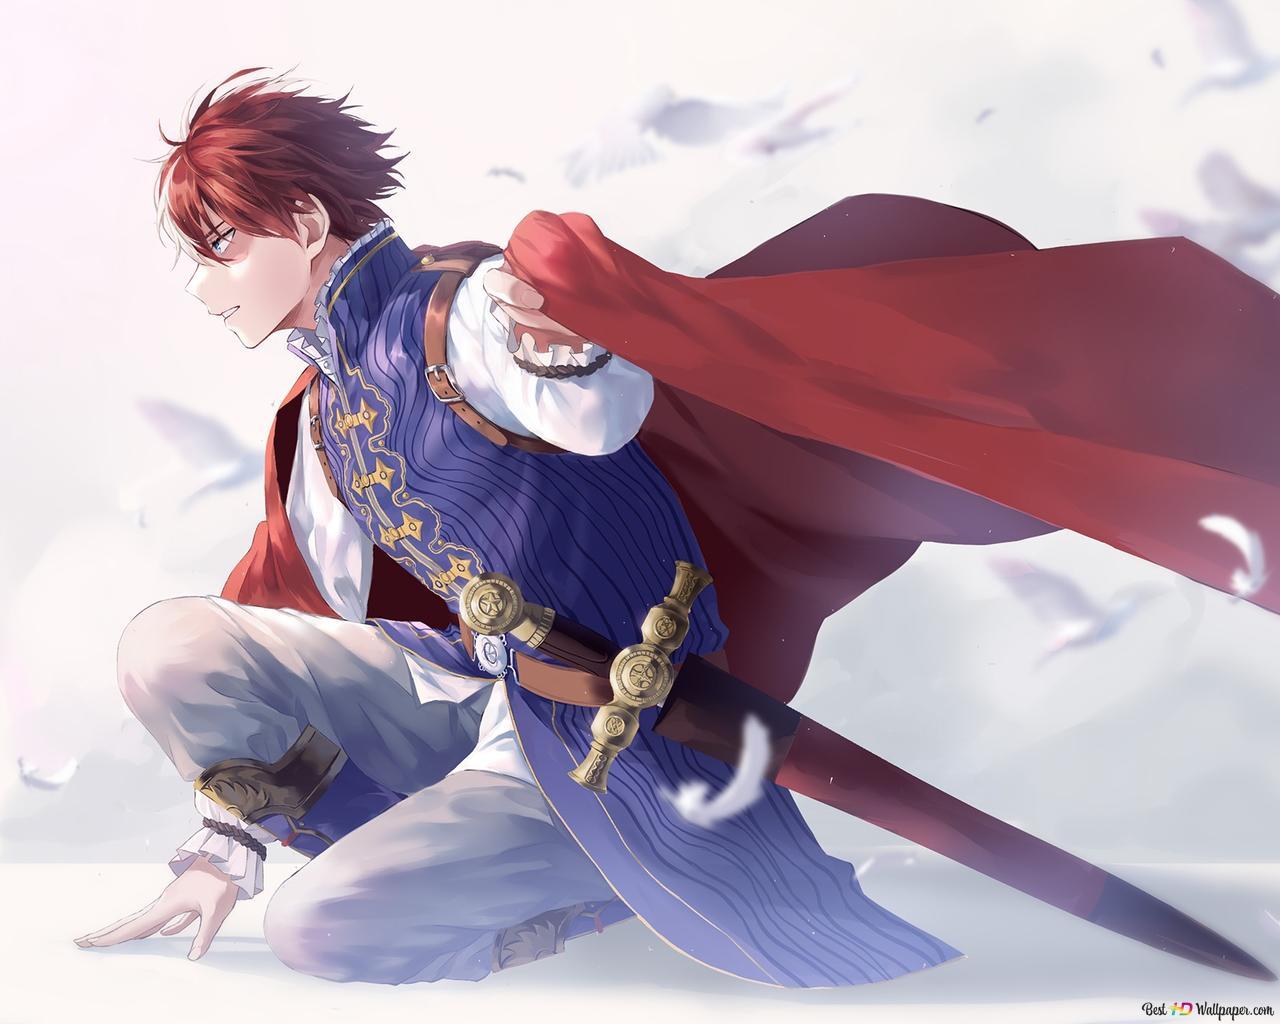 prince shoto todoroki wallpaper 1280x1024 20960 32